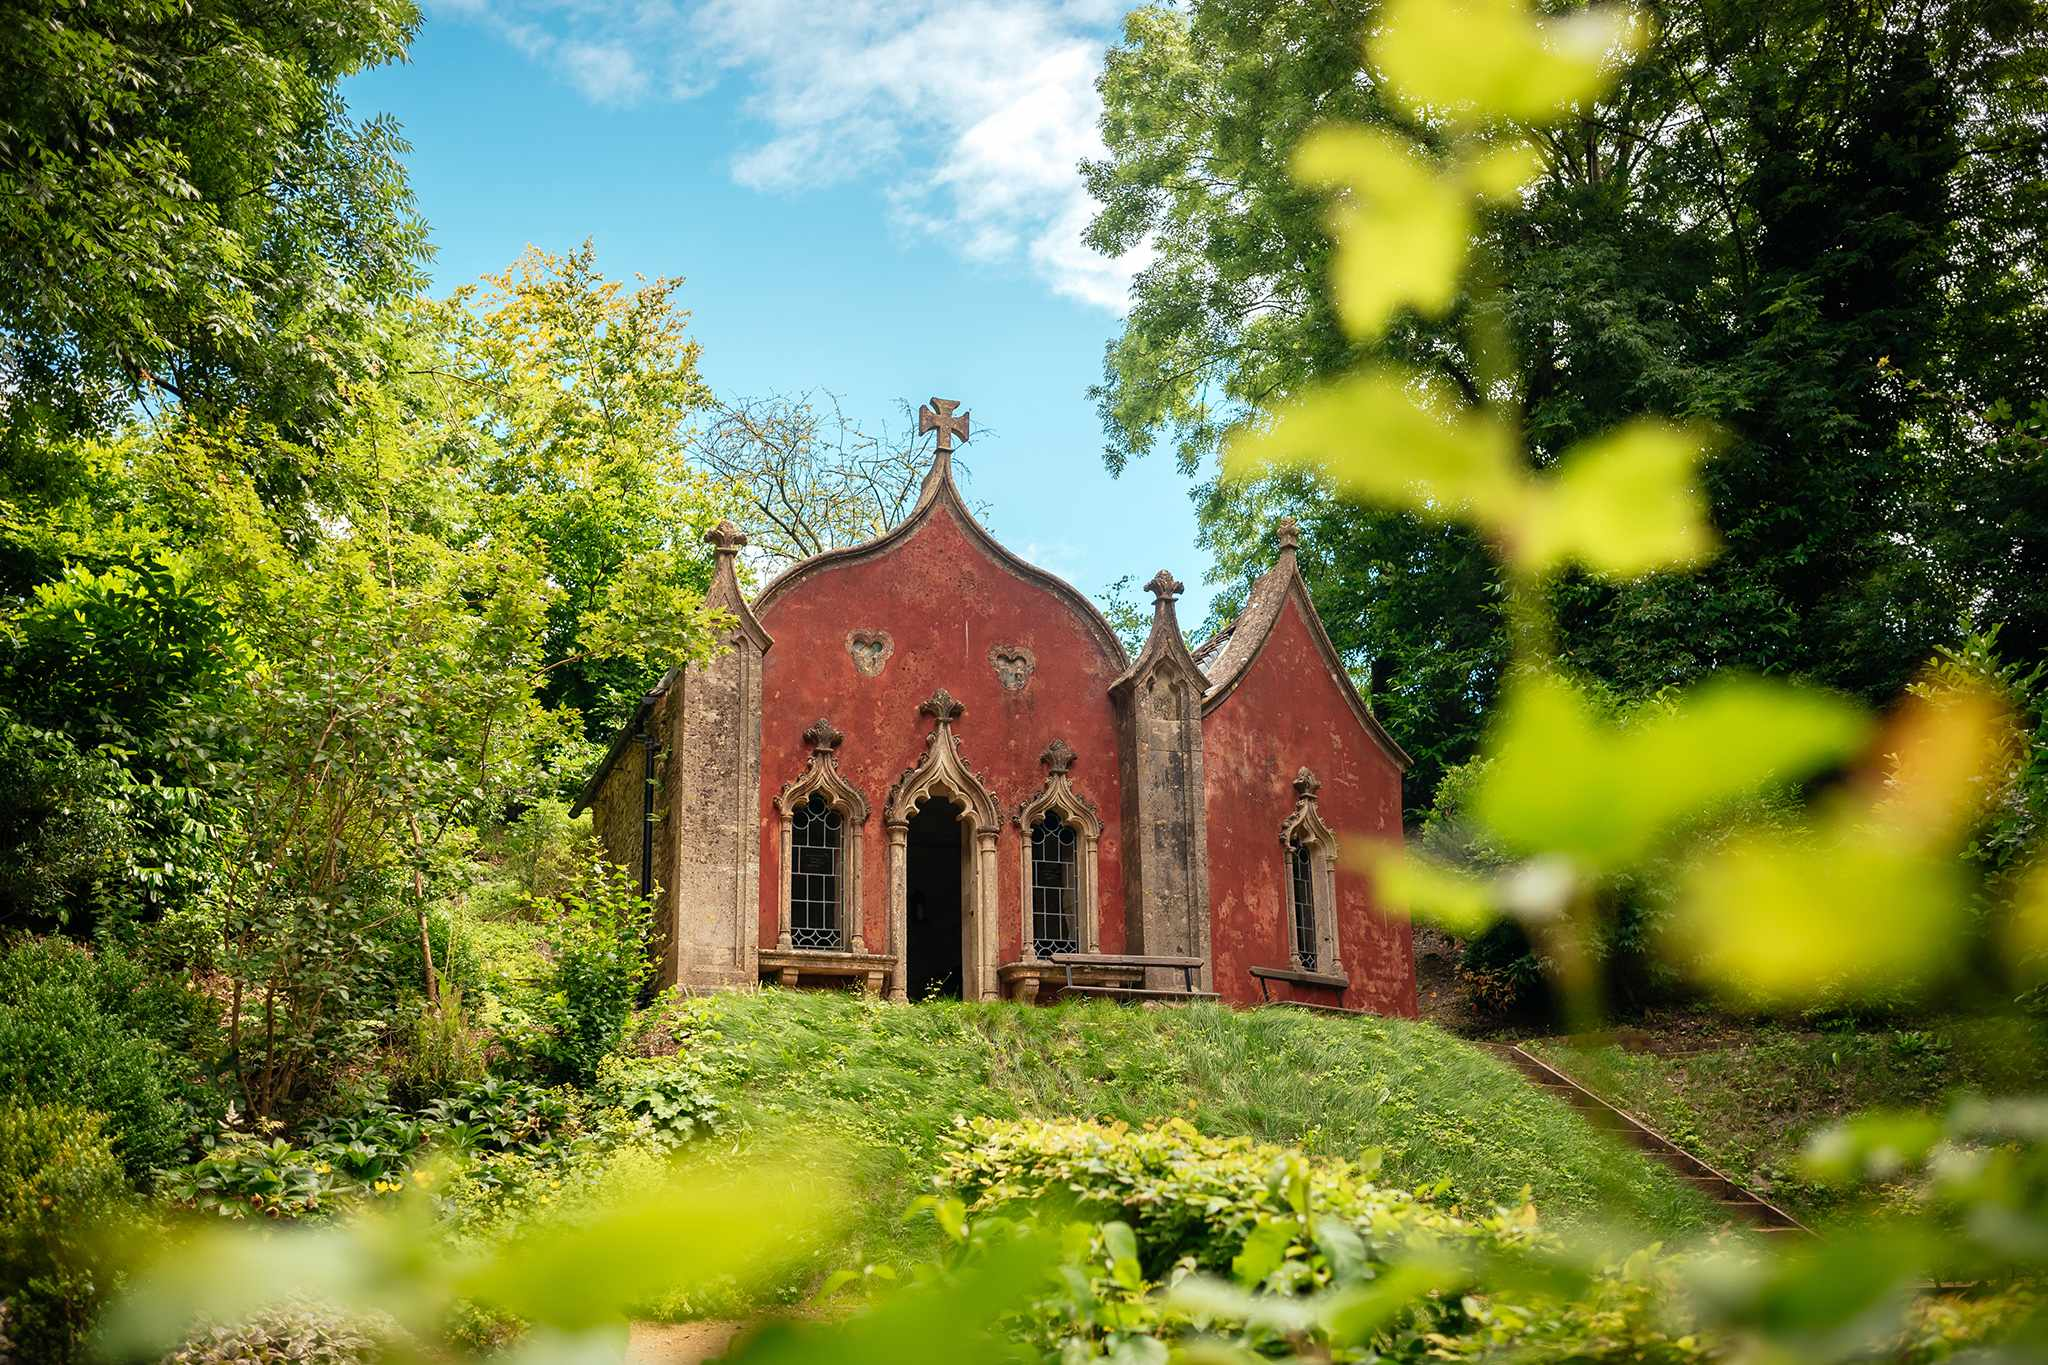 Painswick Roccoco Gardens